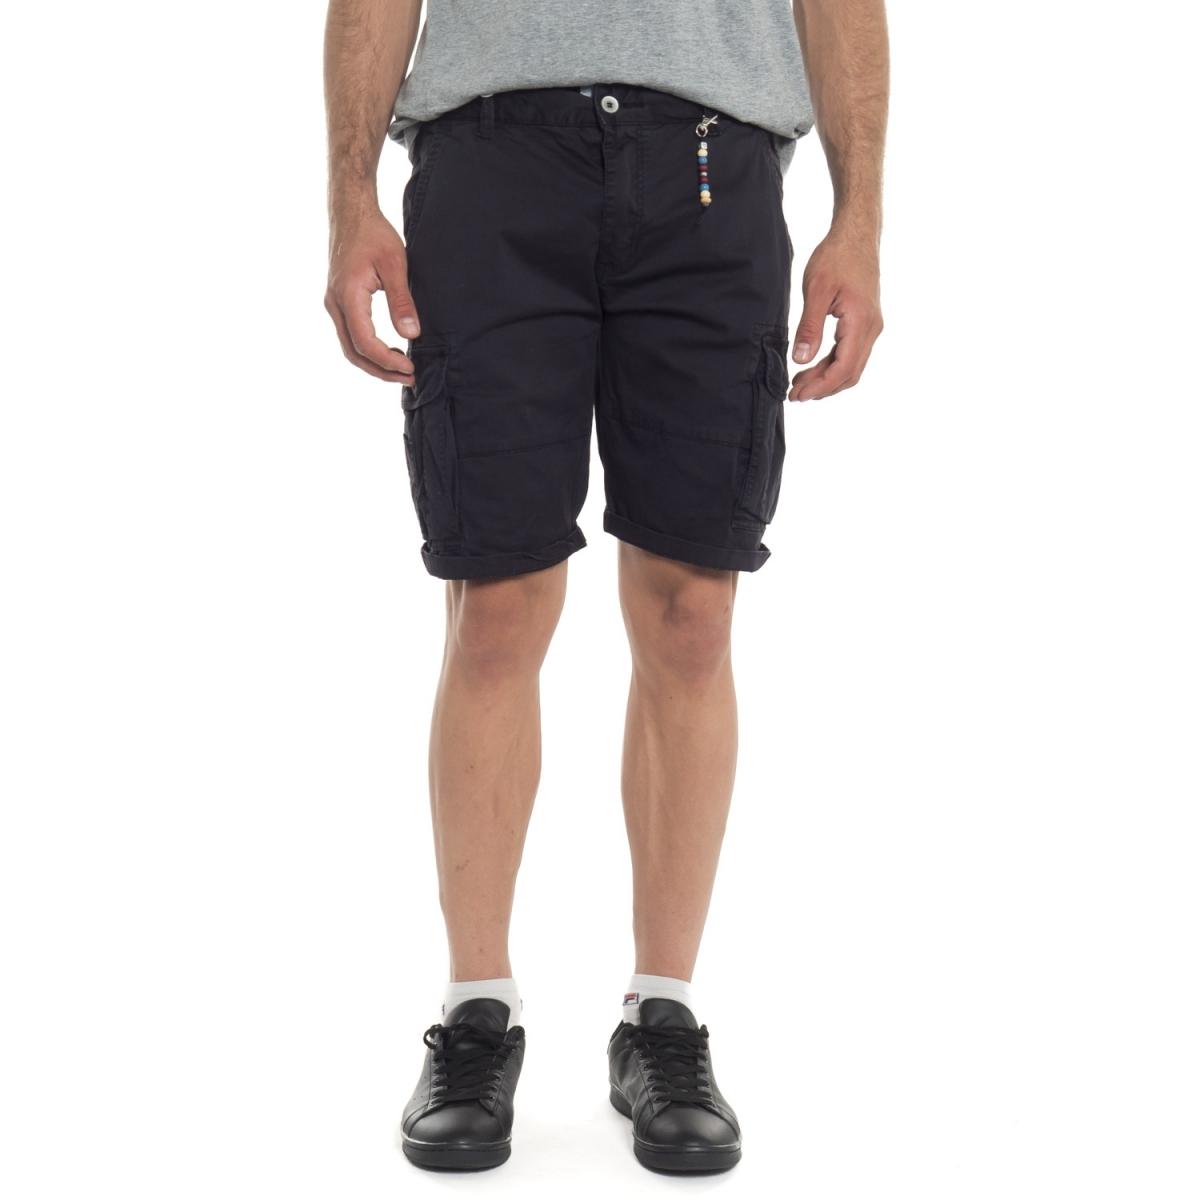 clothing Shorts men Bermuda LPLK2018 LANDEK PARK Cafedelmar Shop